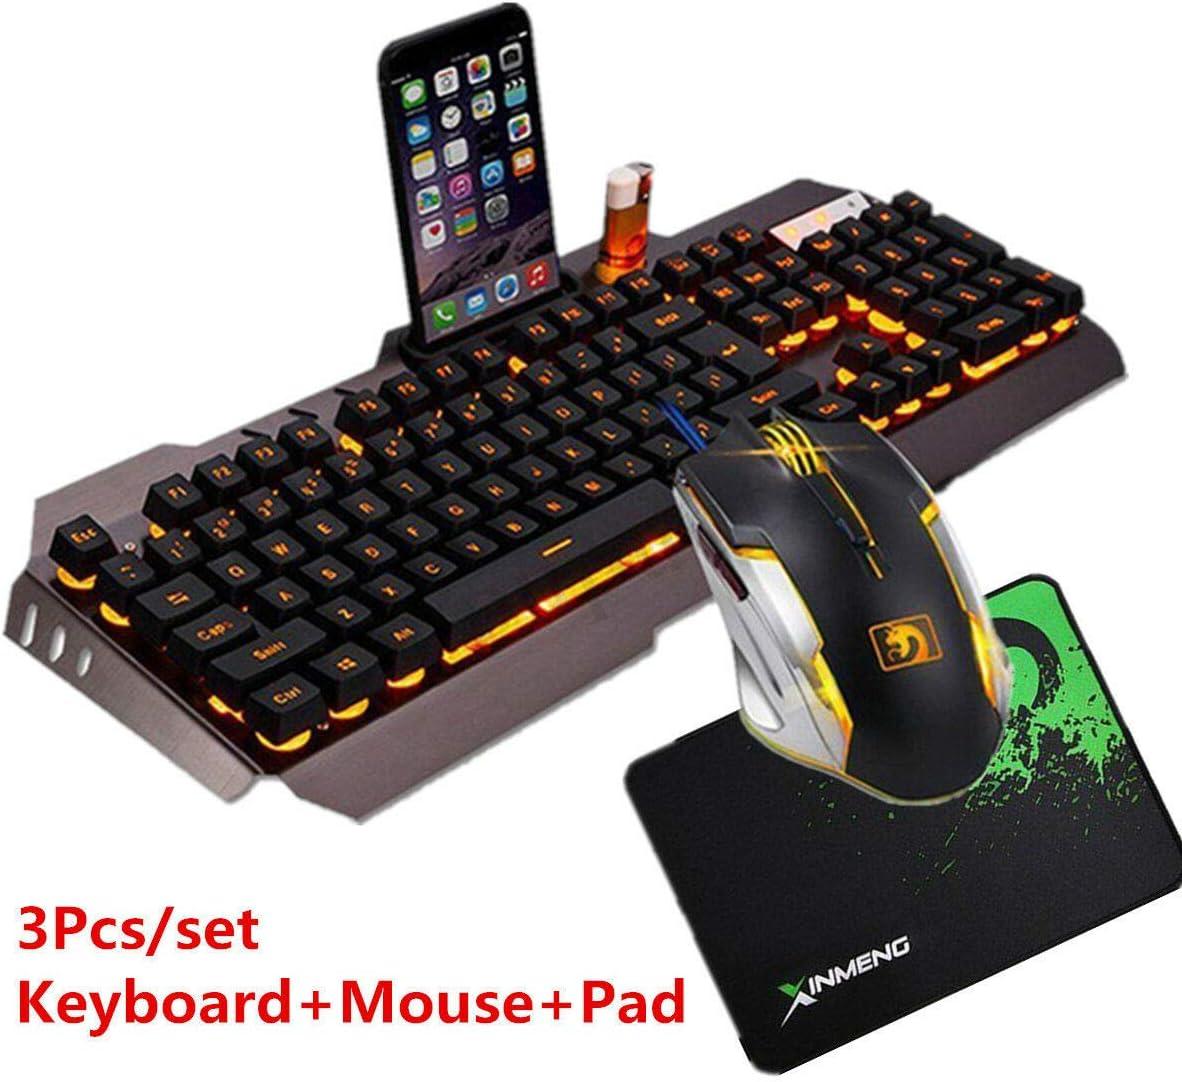 ACHICOO Computer Desktop Gaming Keyboard and Mouse Mechanical Feel LED Light Backlit